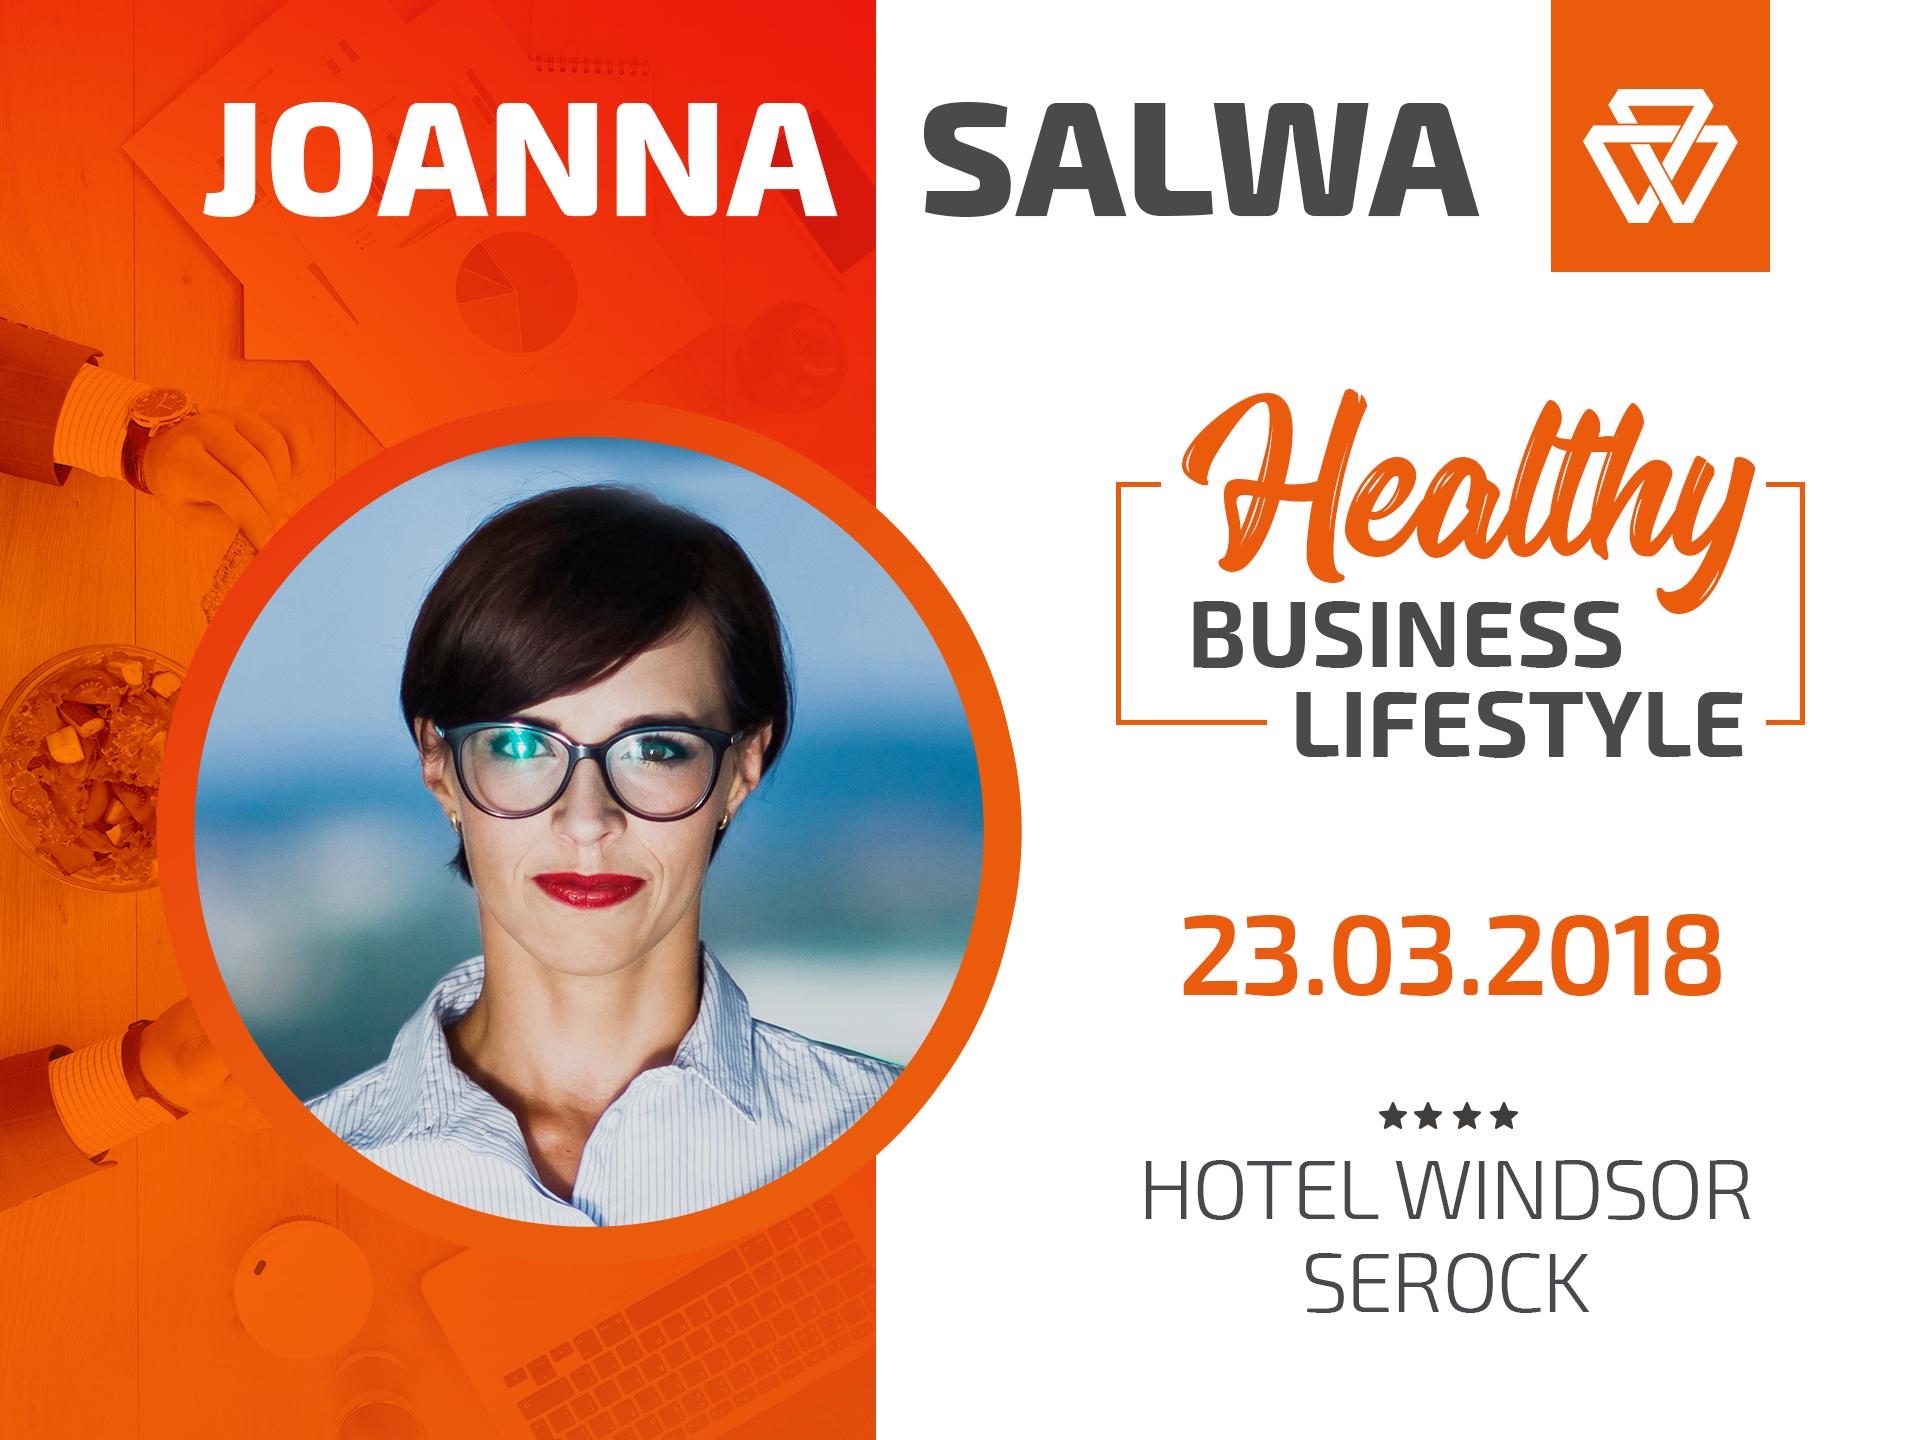 VANTIS_slajd_szkolenie-Joanna-Salwa_05032018-b.png